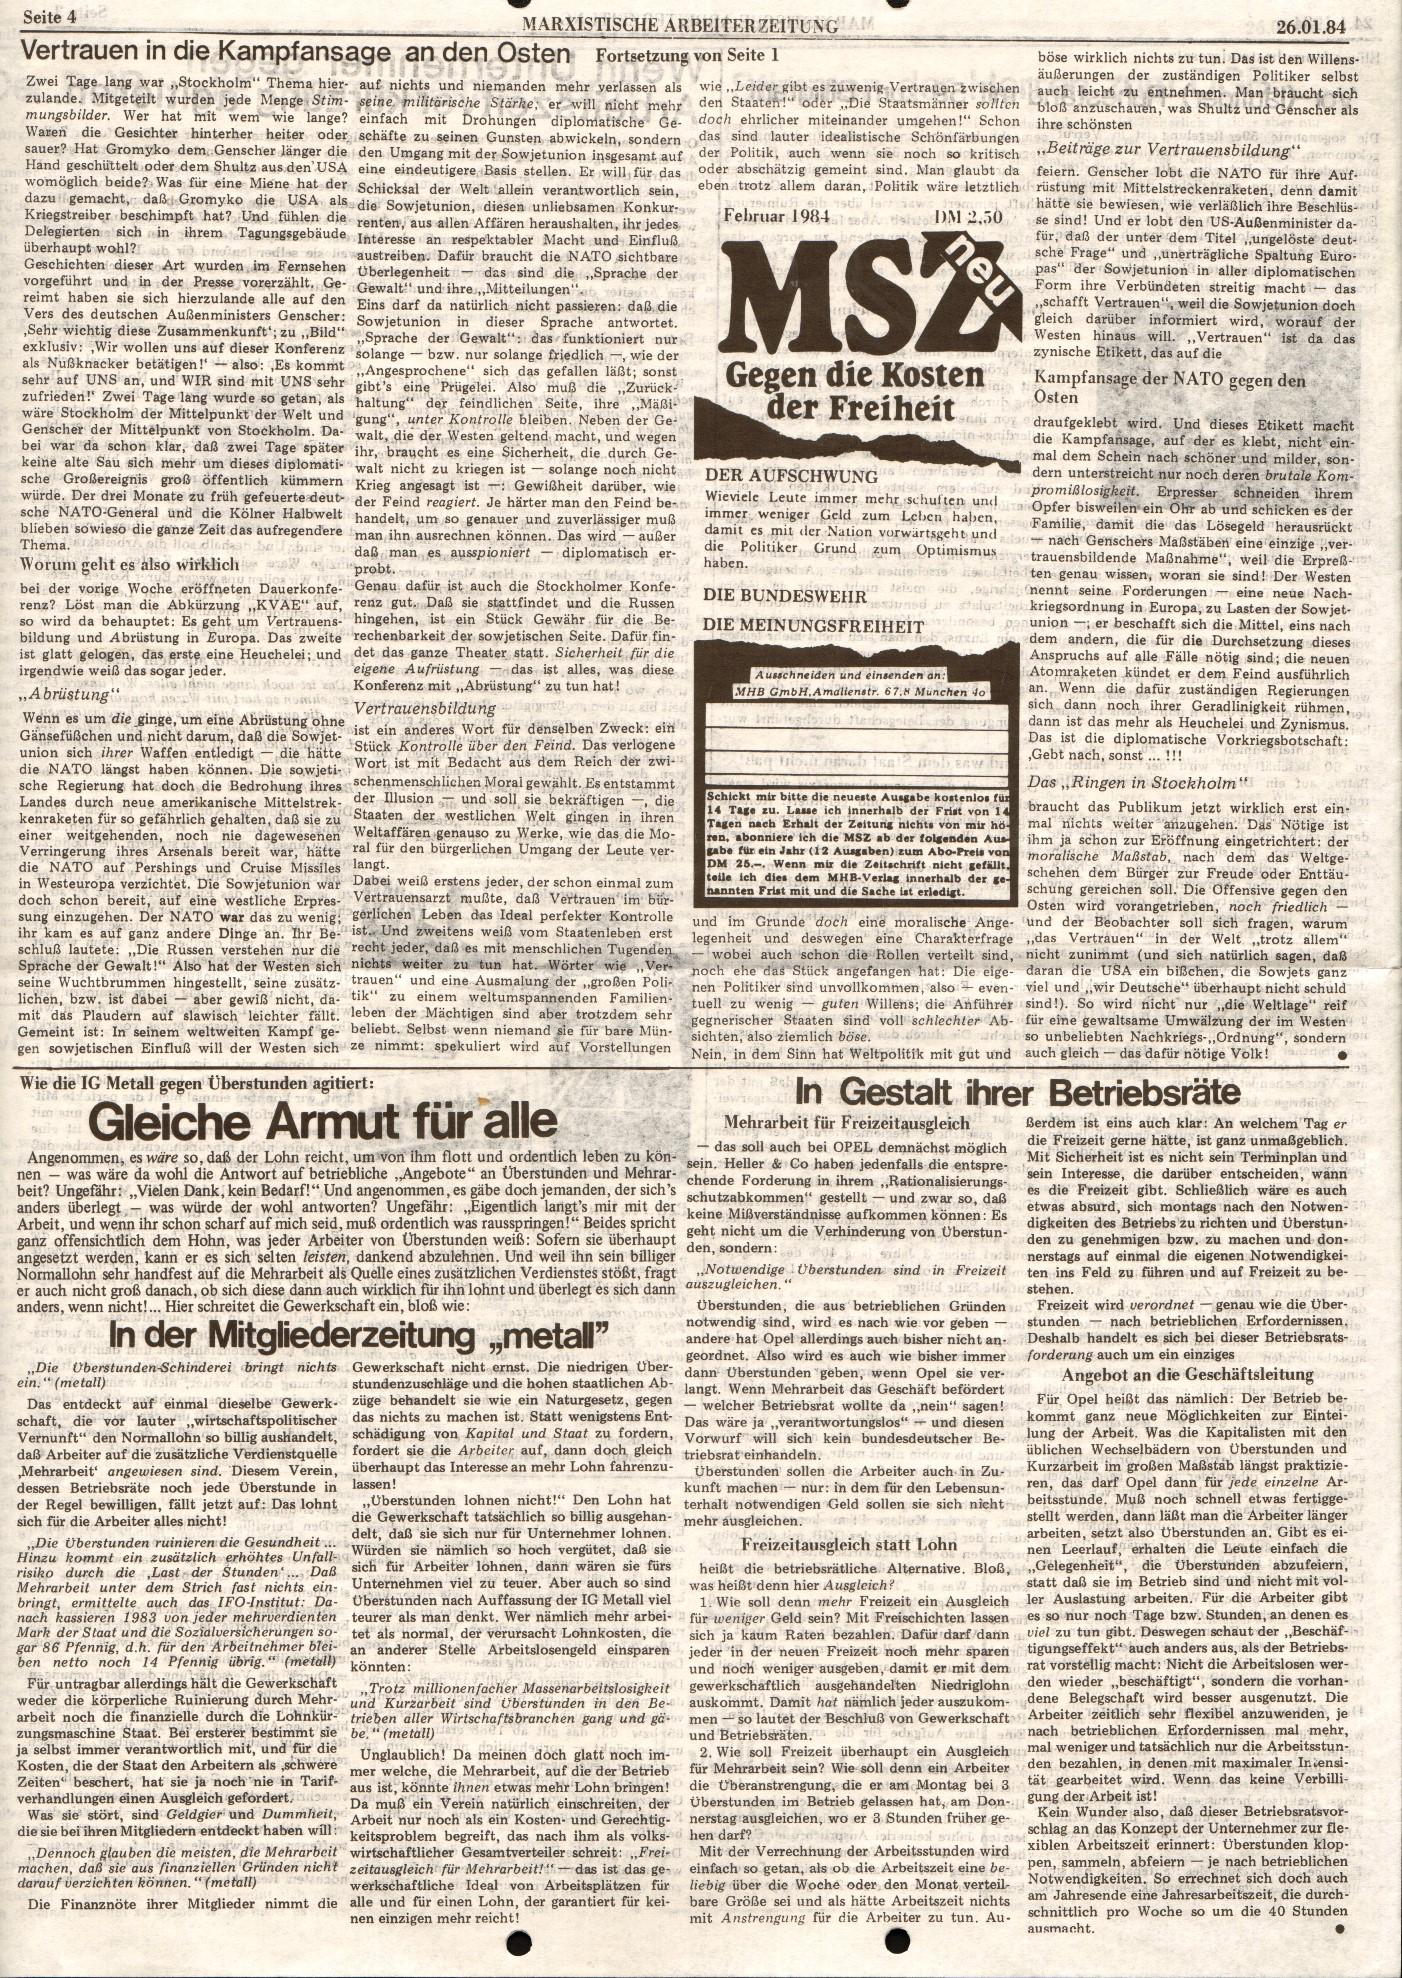 Ruesselsheim_MG_Marxistische_Arbeiterzeitung_Opel_19840126_04